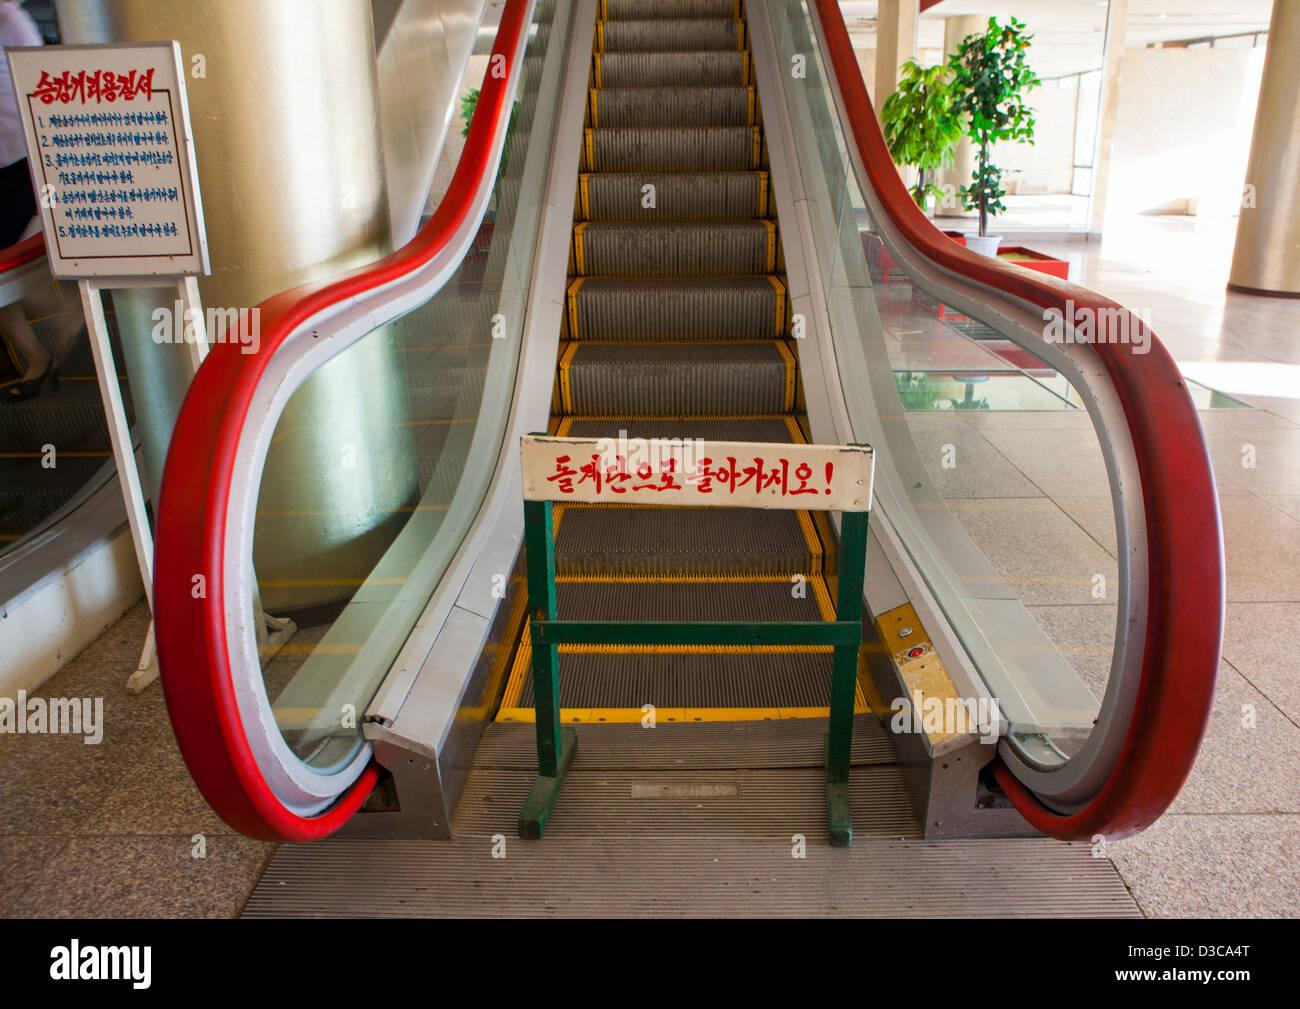 Escalator In Songdowon International Children's Camp, Wonsan, North Korea, North Korea - Stock Image